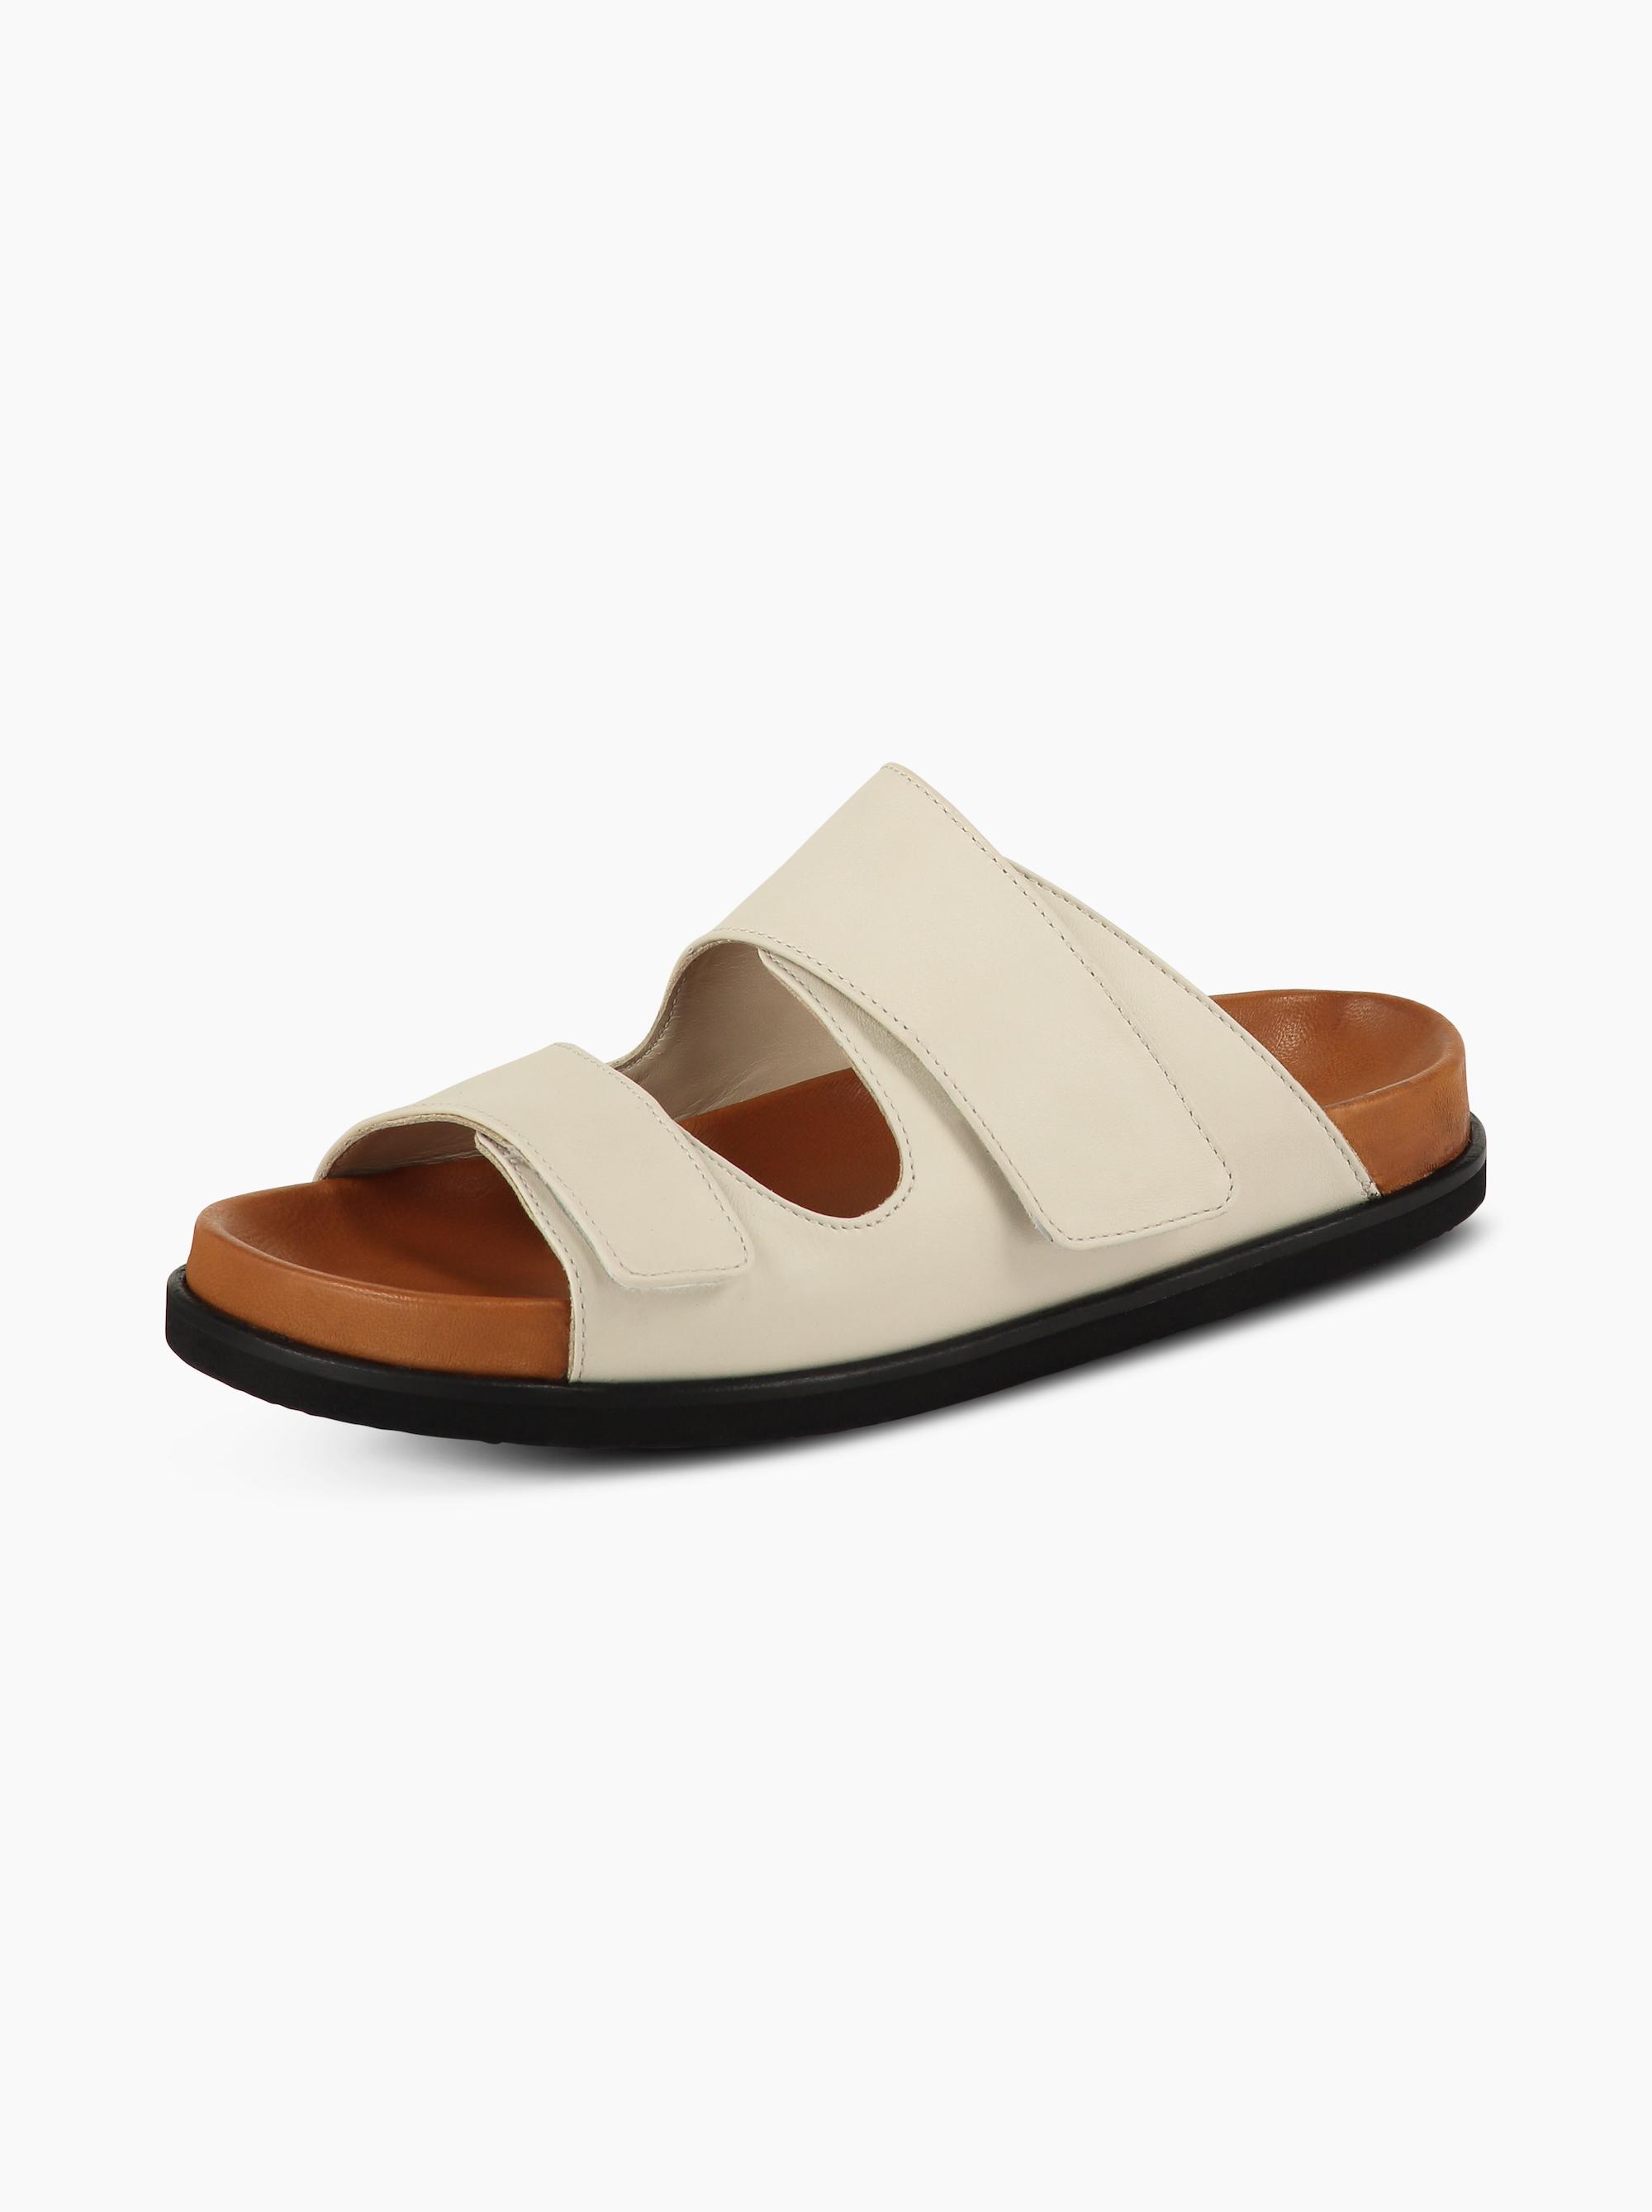 Teym - The Sandal - White - 6b